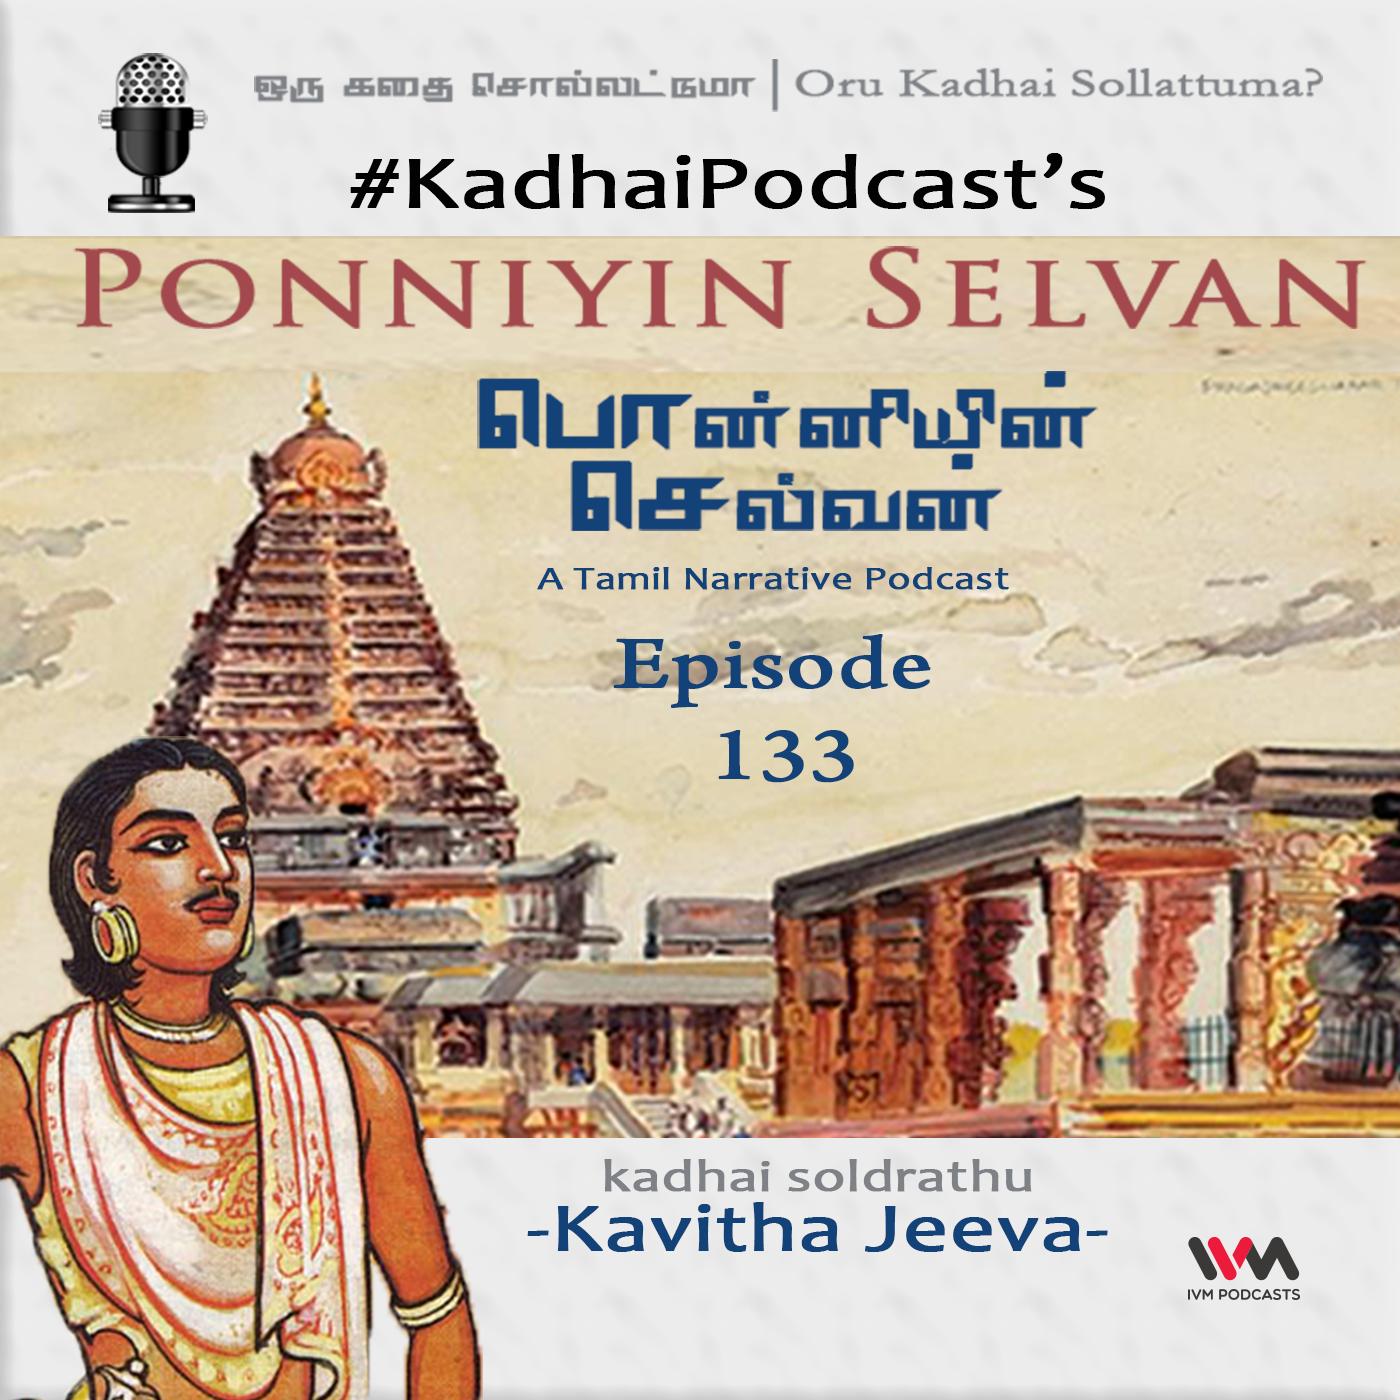 KadhaiPodcast's Ponniyin Selvan - Episode # 133